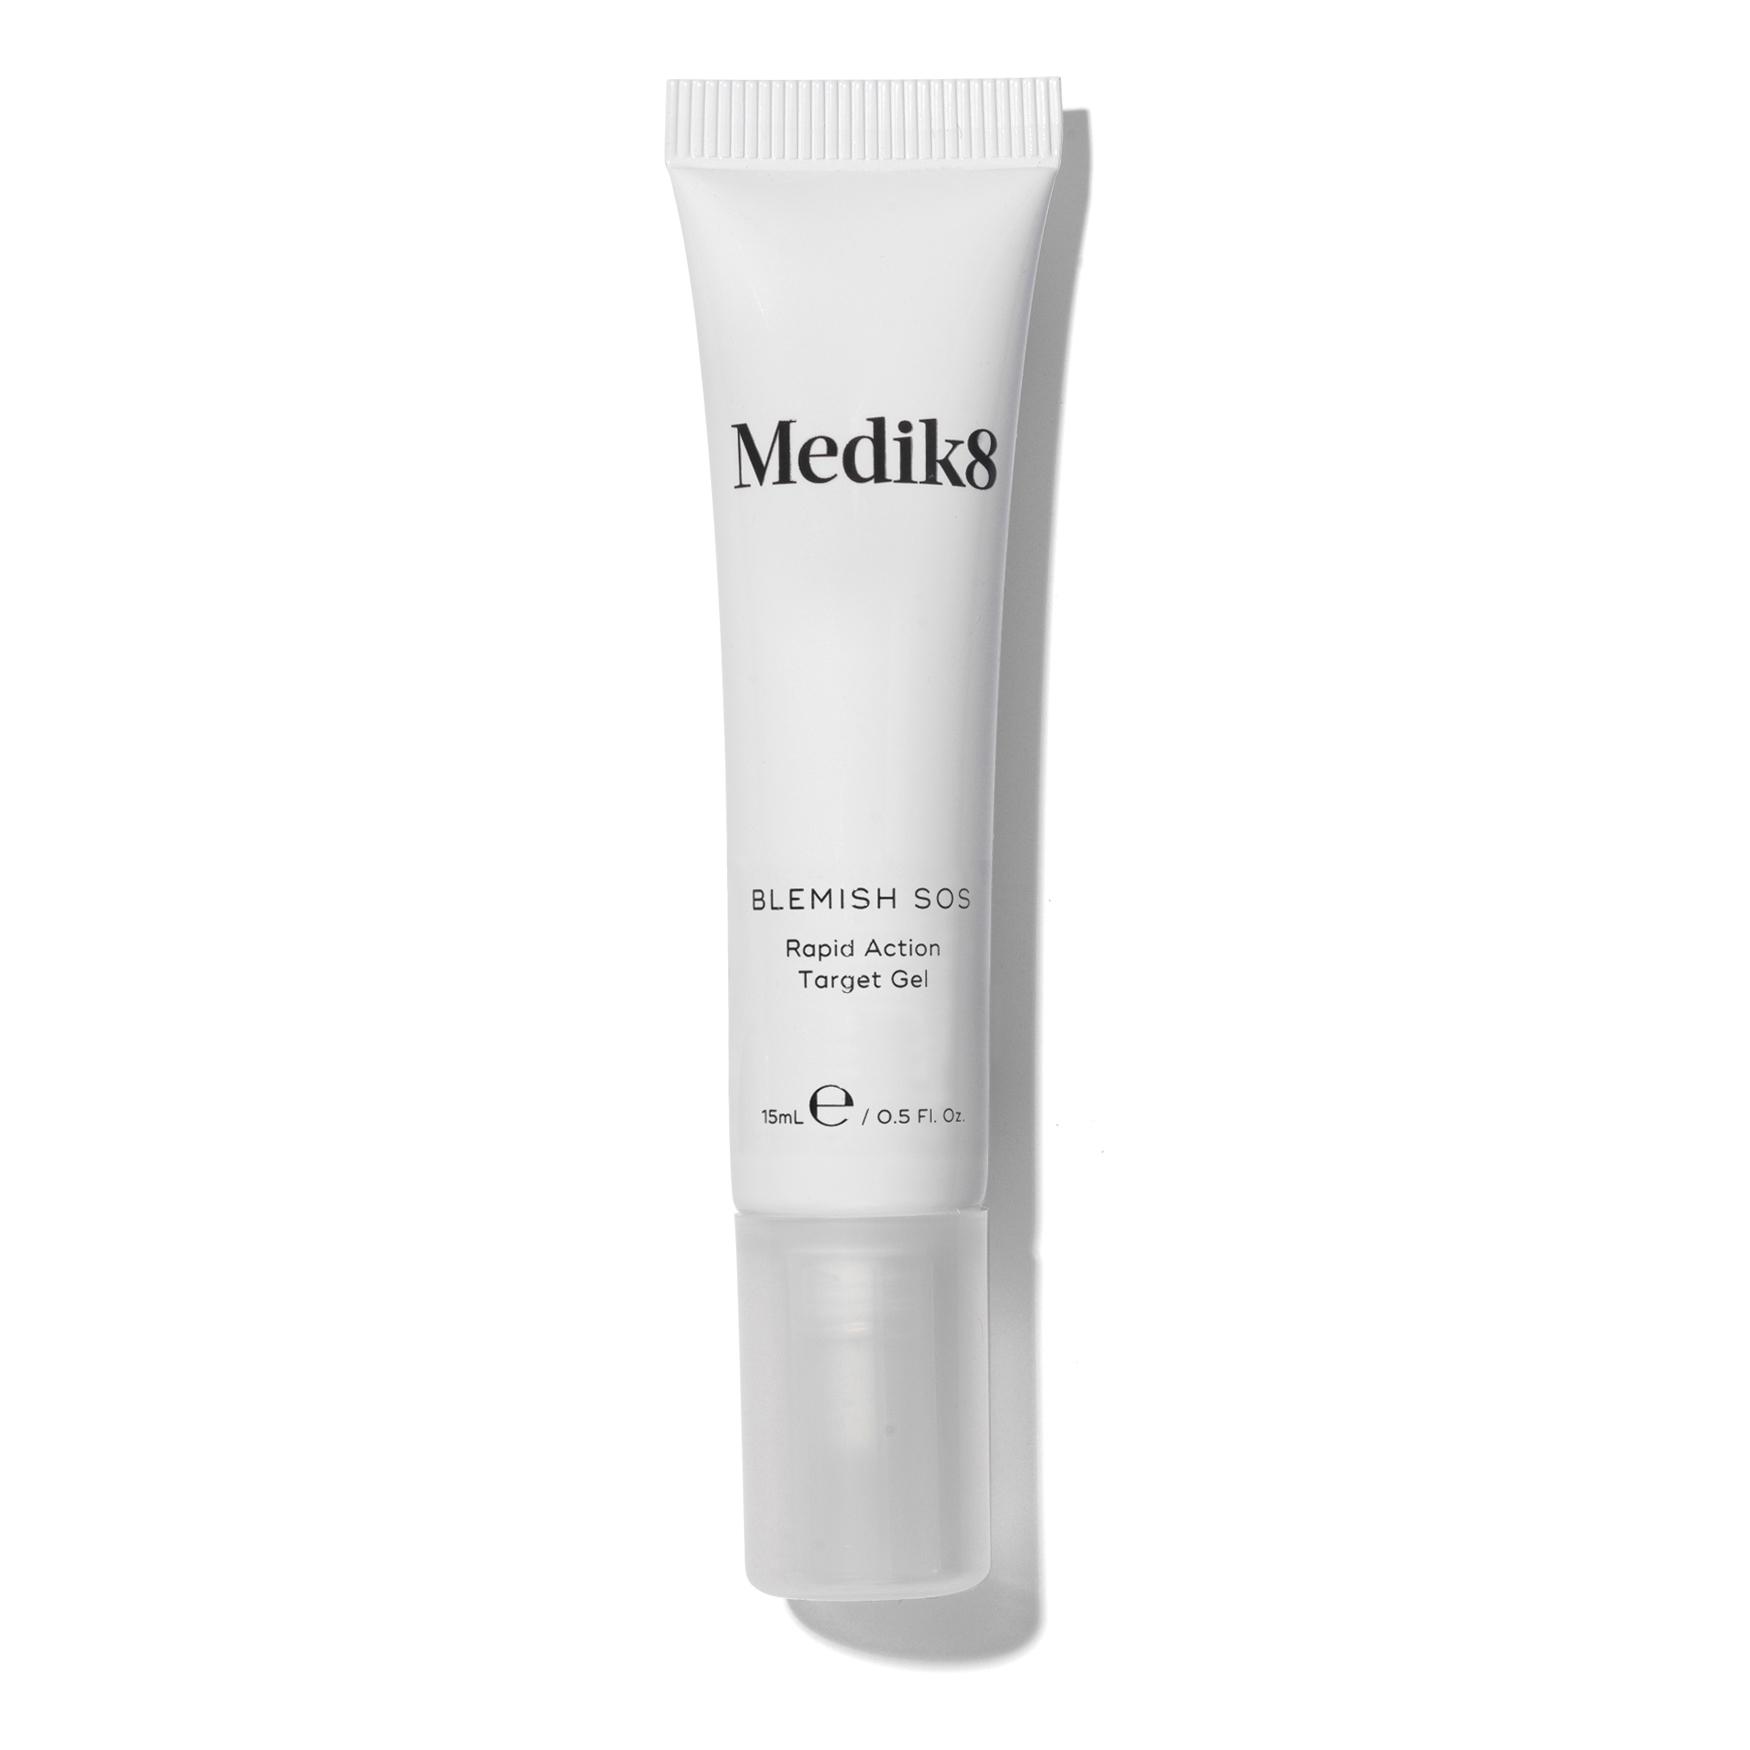 blemish sos rapid action target gel by medik8